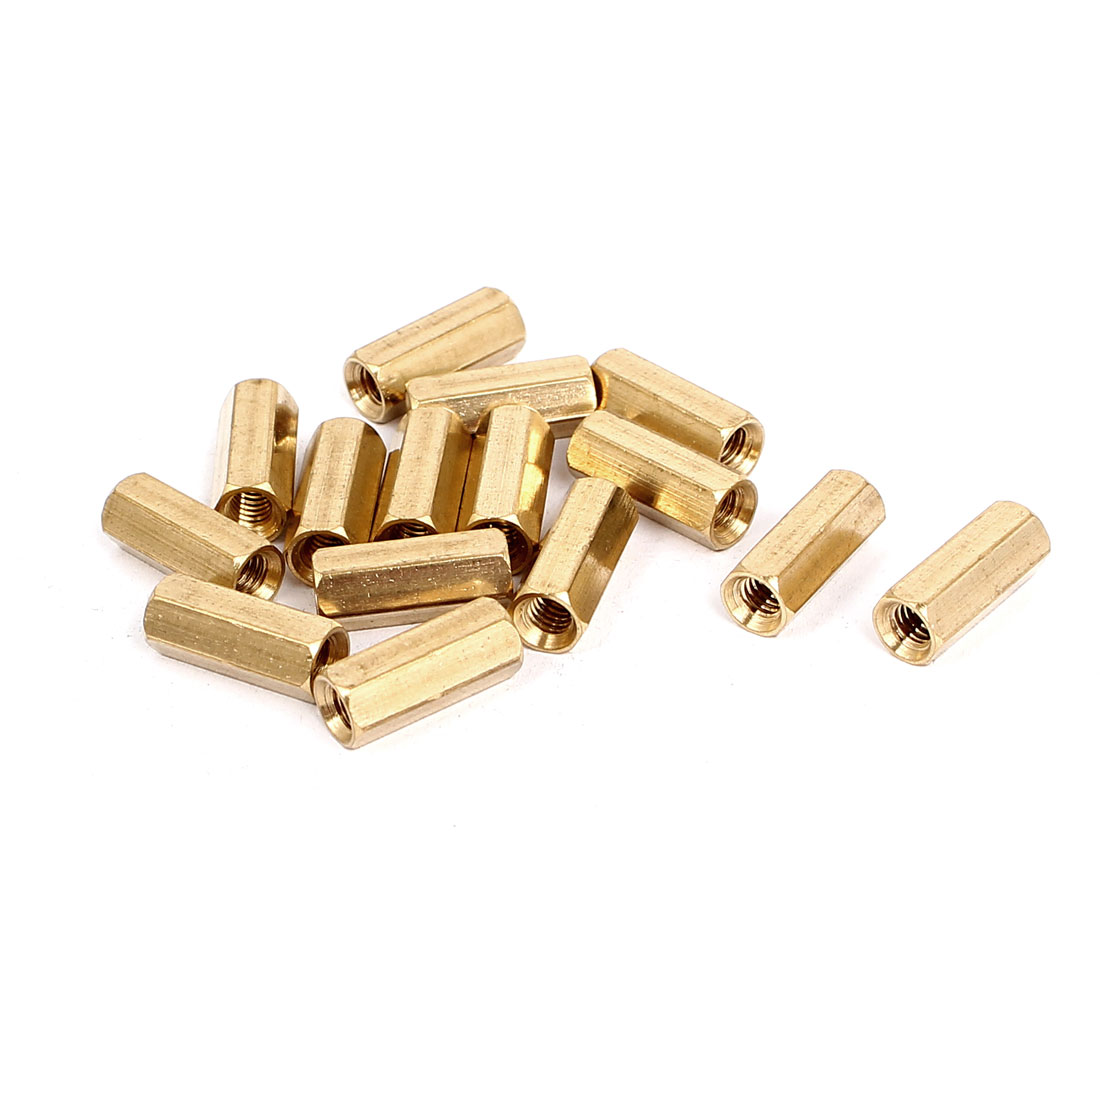 M4x15mm Brass Hex Hexagonal Female Thread PCB Standoff Spacer 15pcs